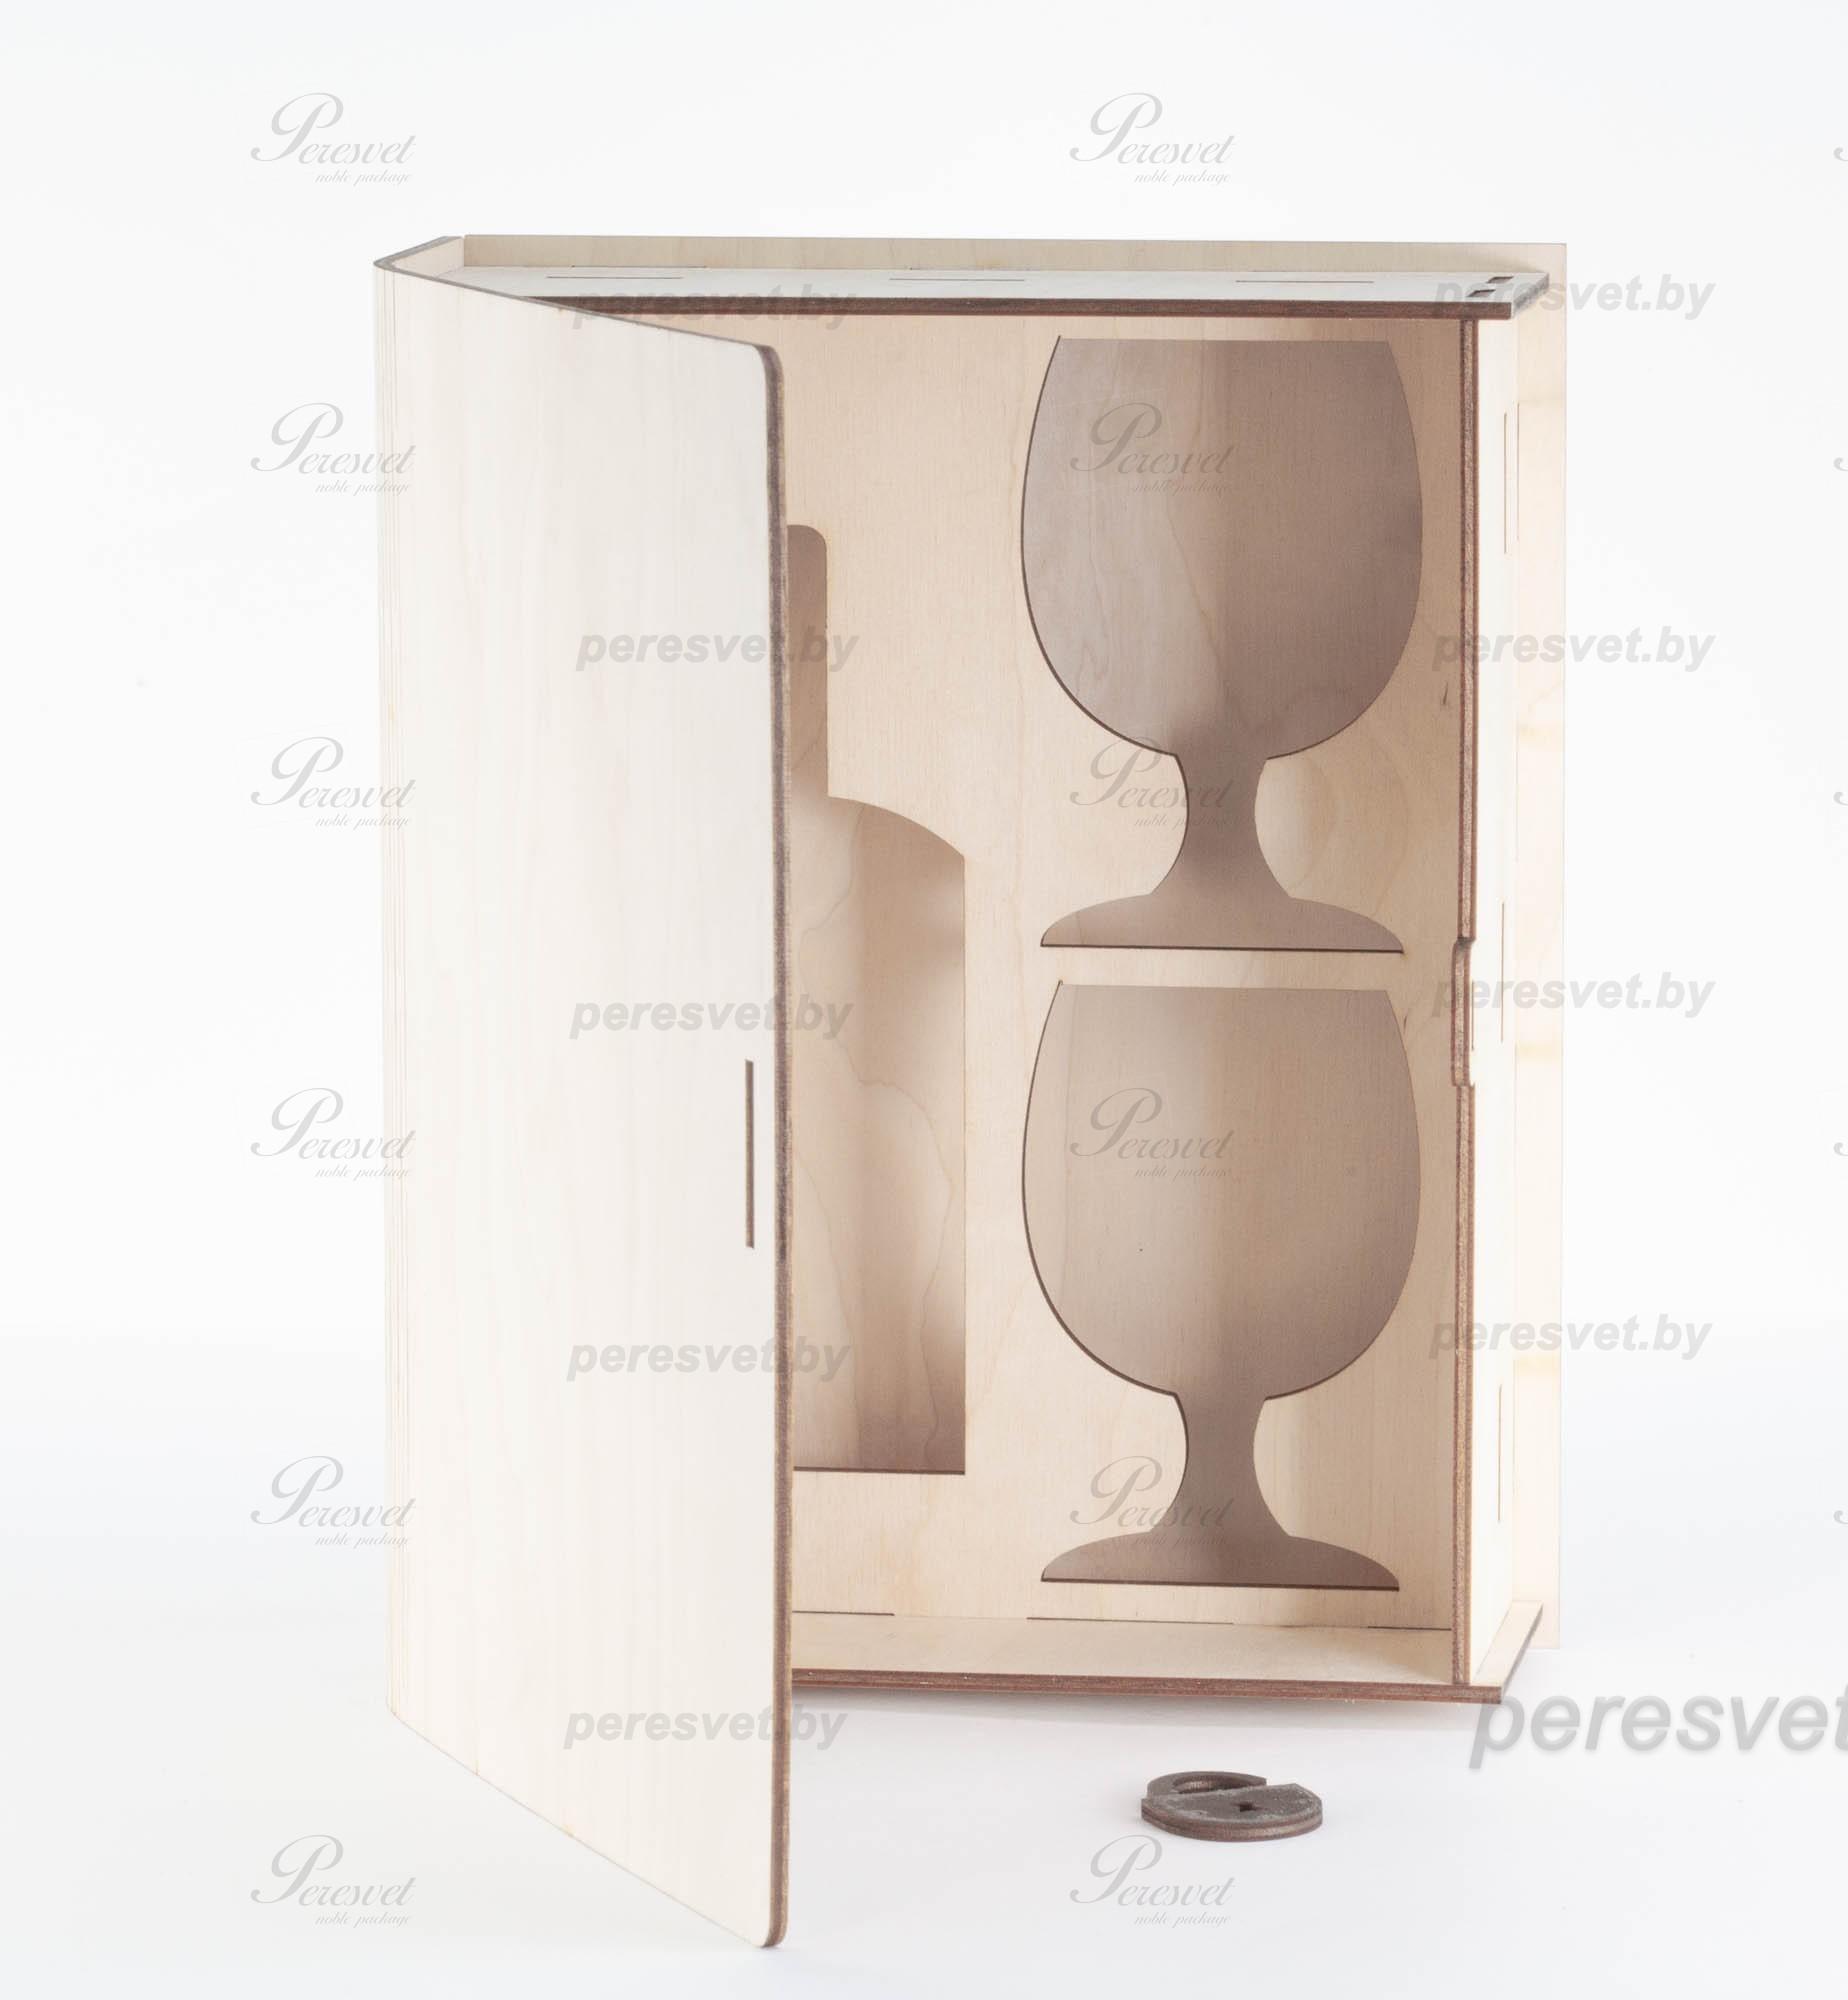 Деревянная коробка под бутылку и два фужера на peresvet.by